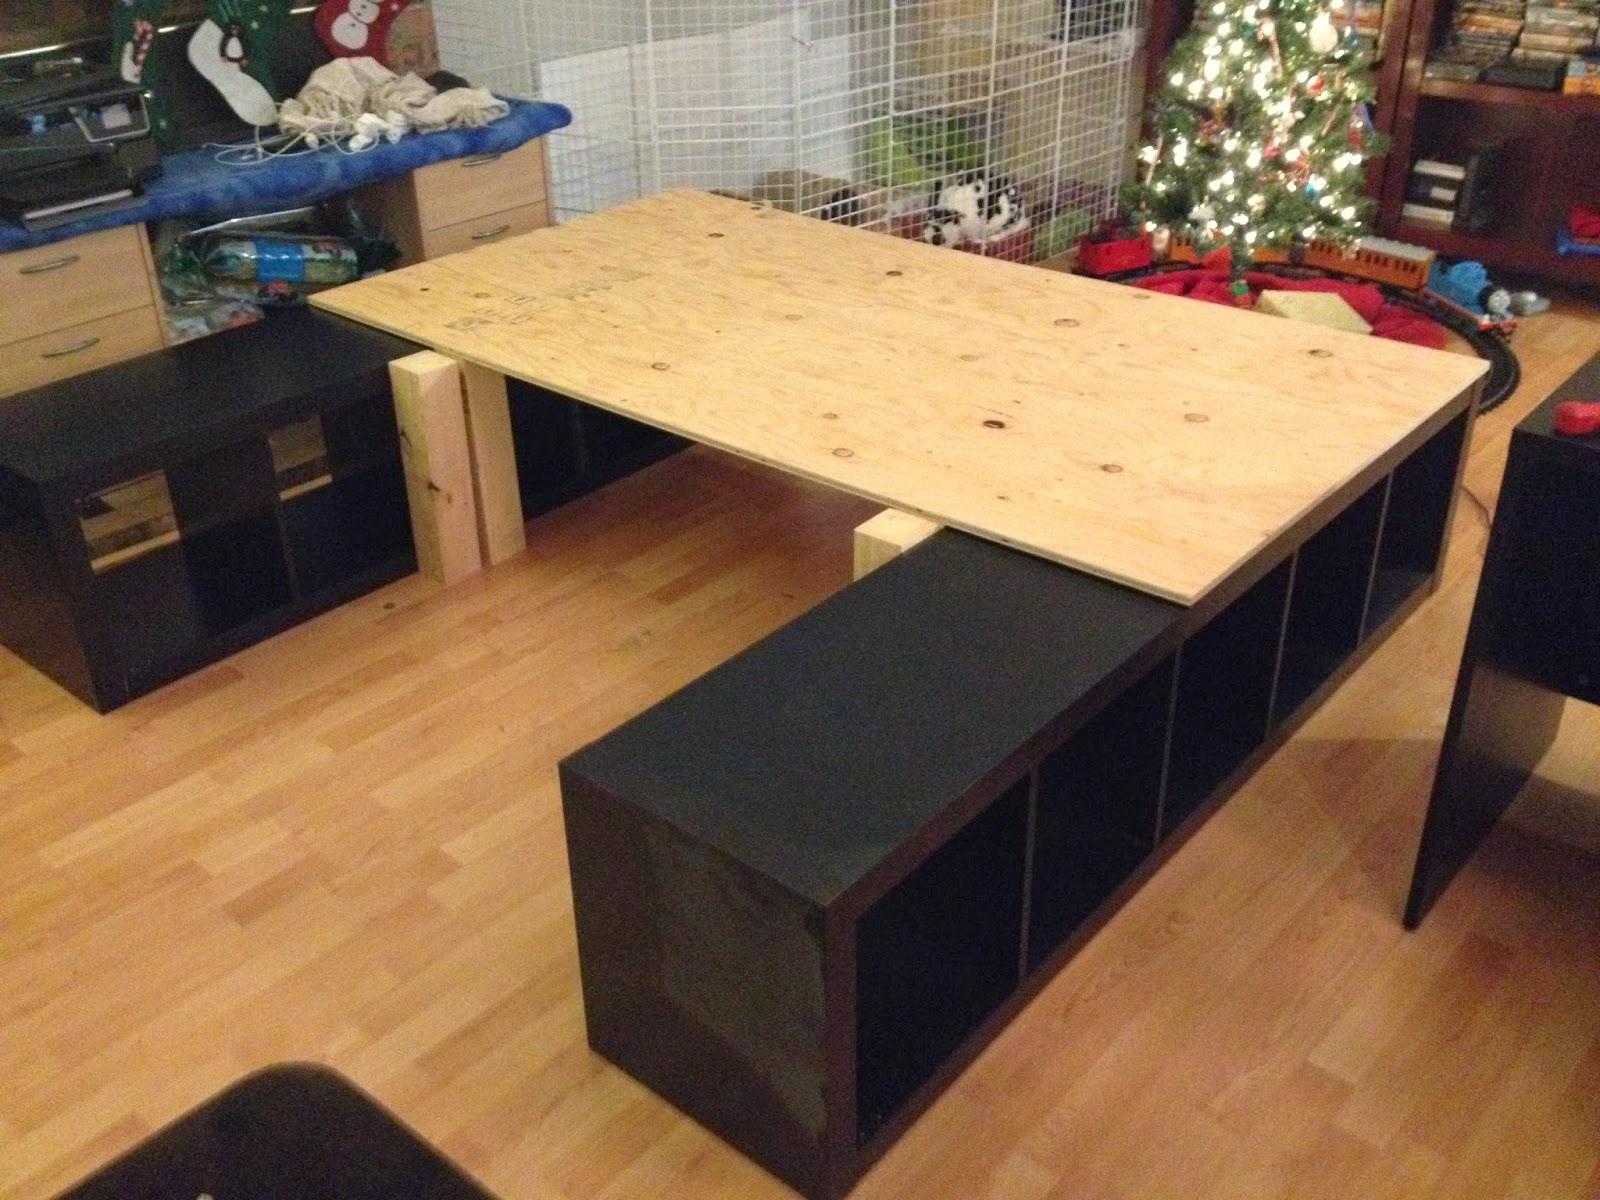 tansy dolls ikea hack king size bed. Black Bedroom Furniture Sets. Home Design Ideas